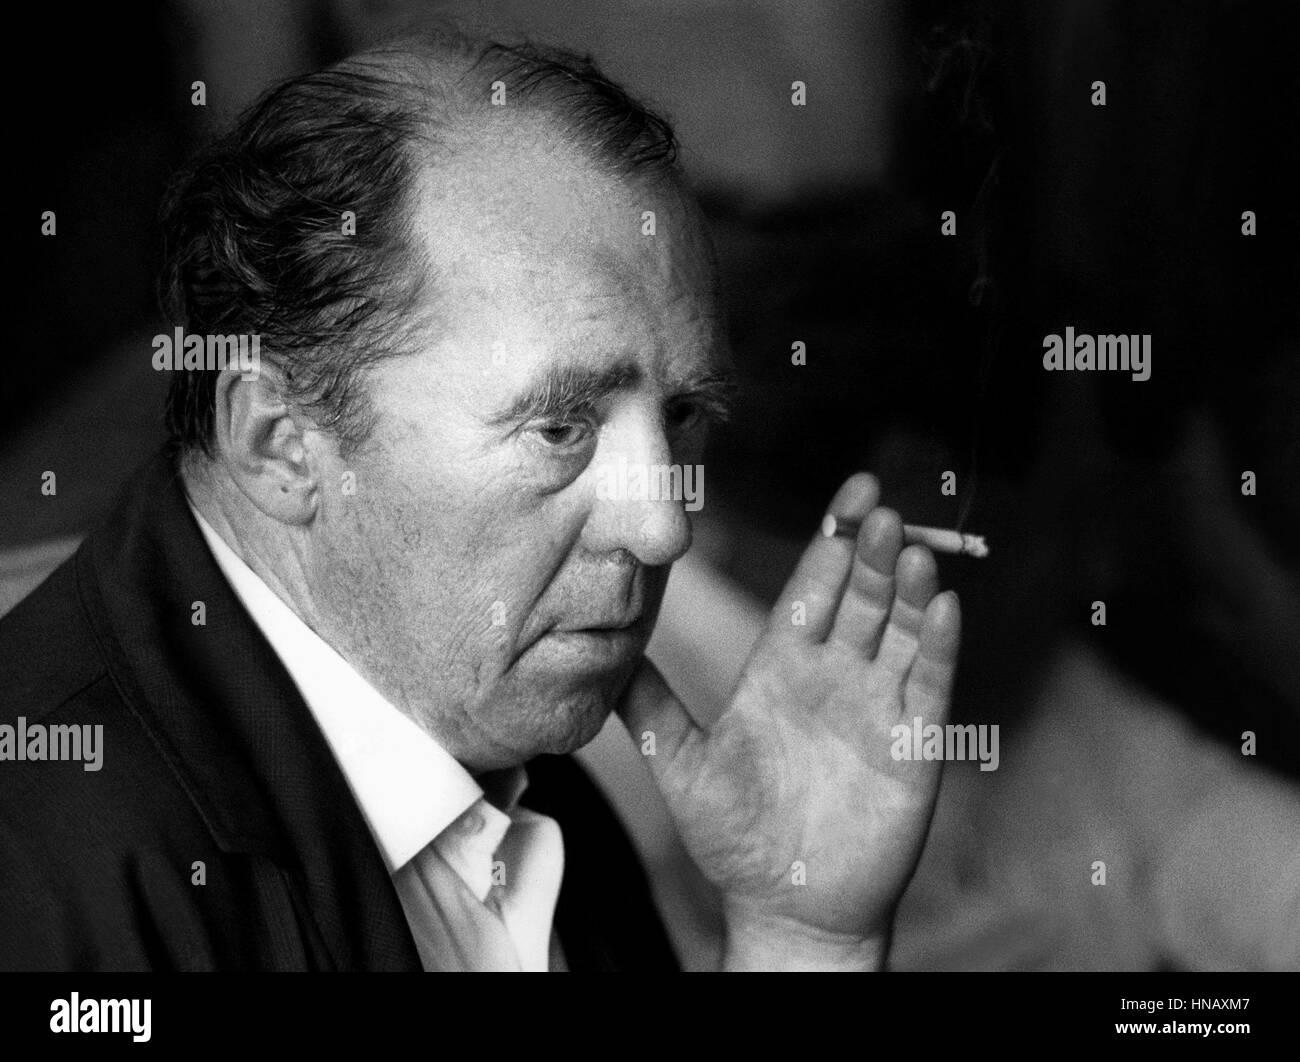 HEINRICH BOLL WRITER (1964) - Stock Image